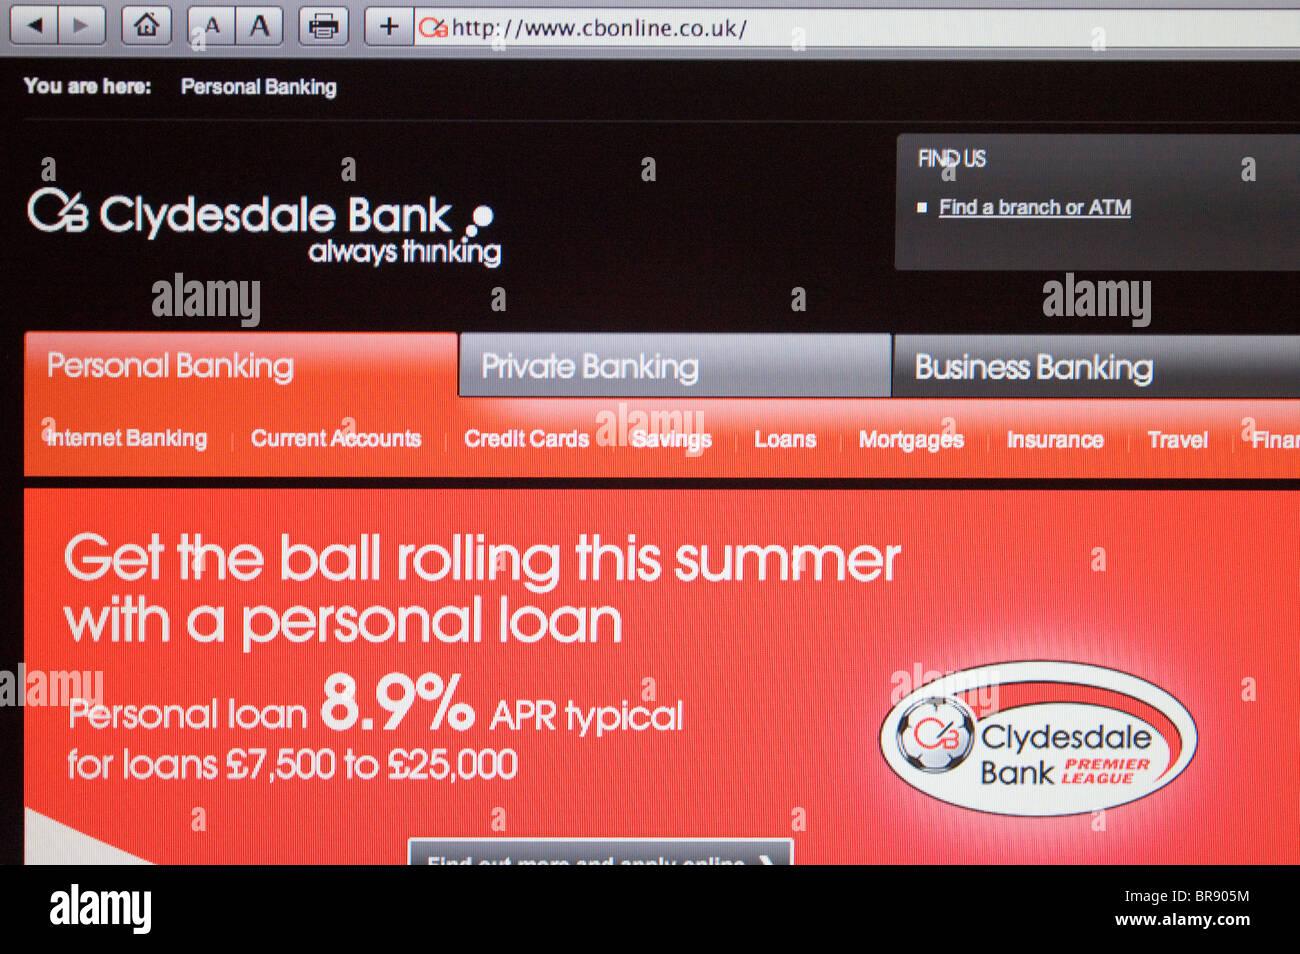 Clydesdale Bank website Screenshot - Stock Image